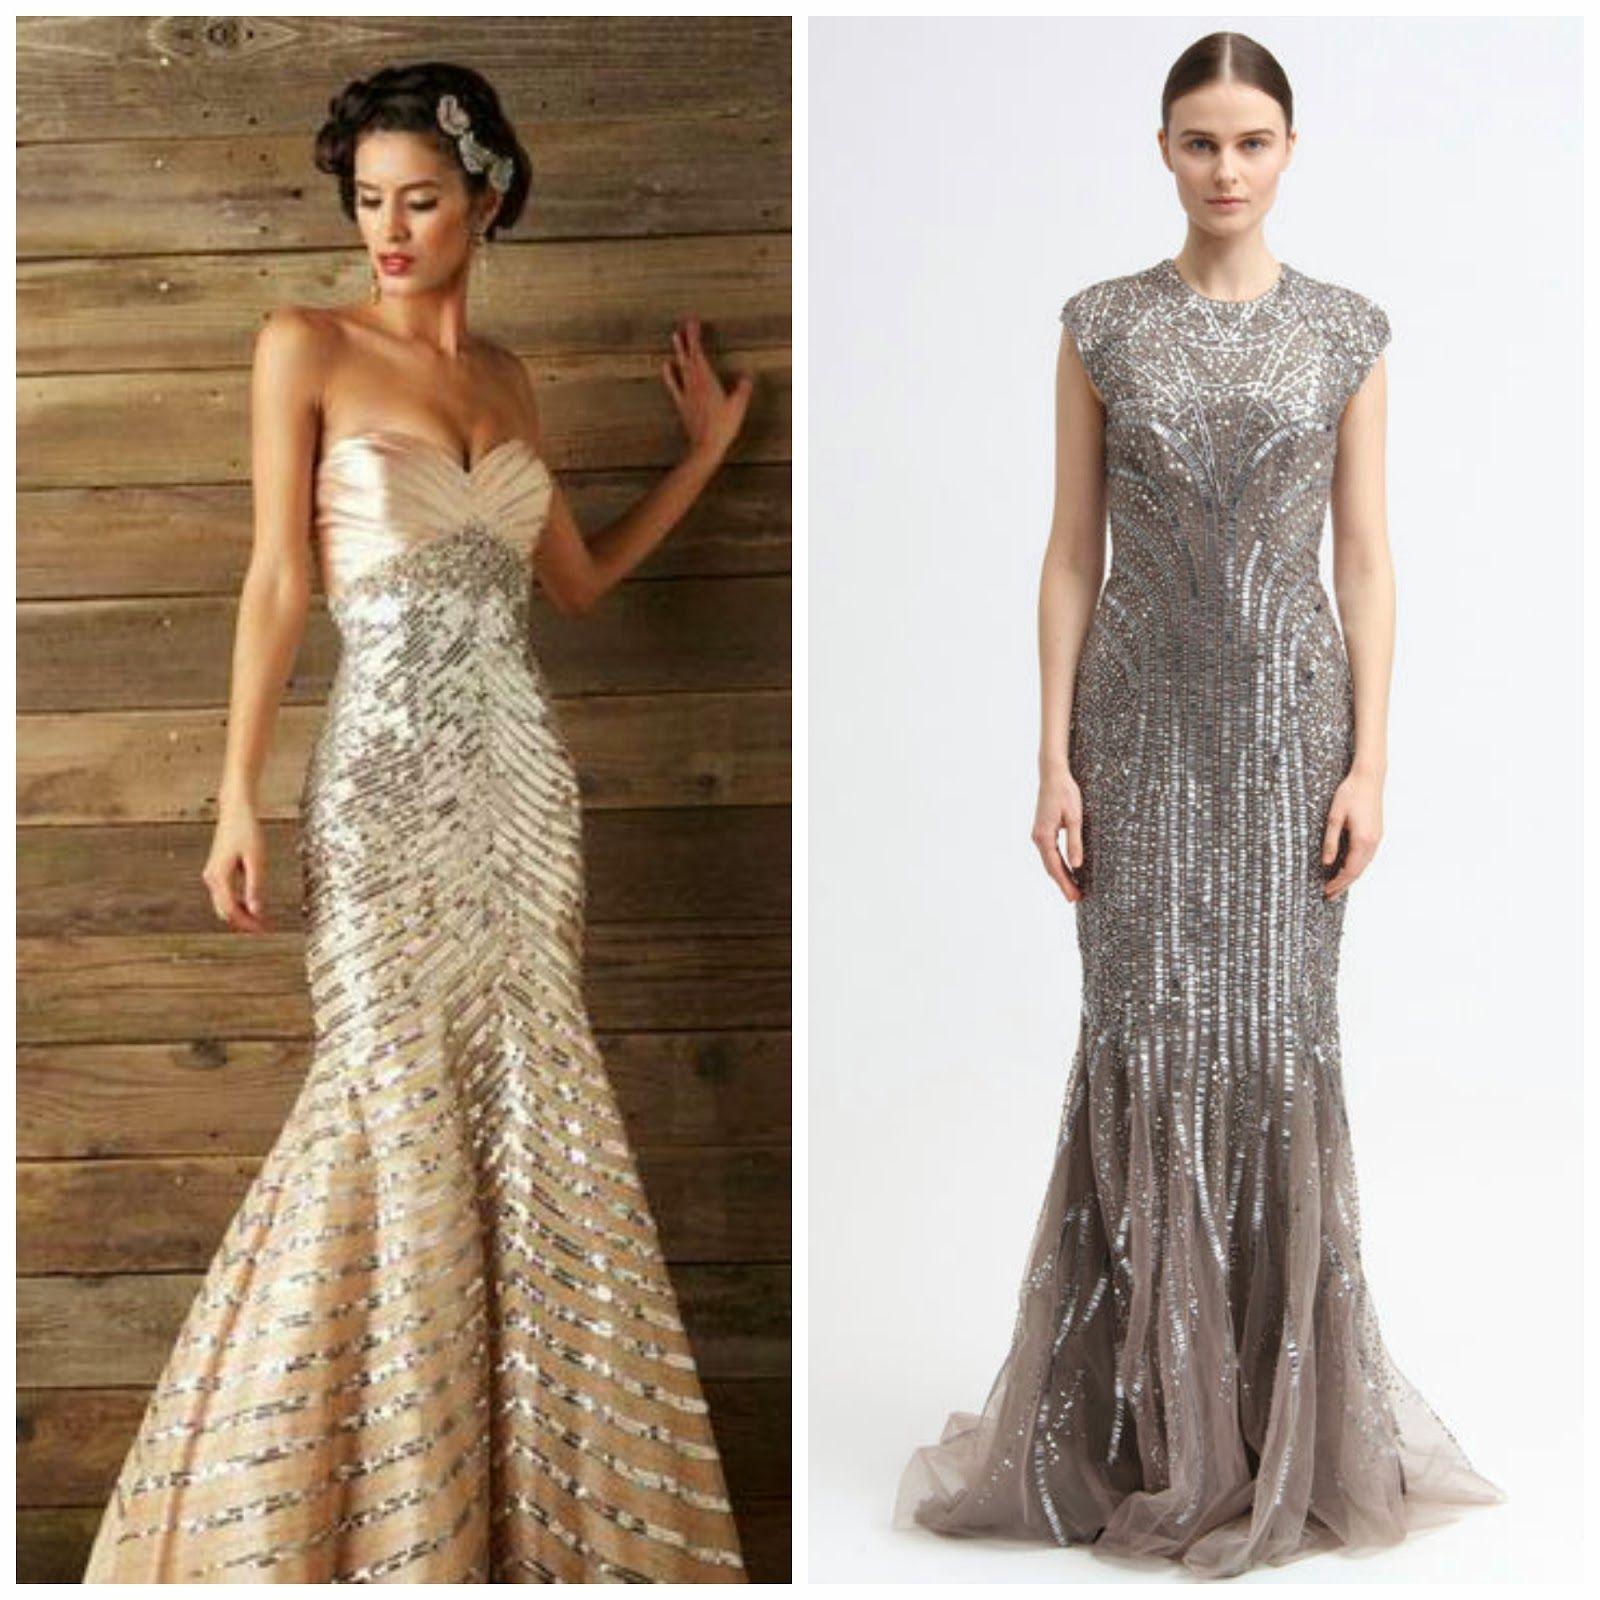 77+ New Years Eve Wedding Dresses - Dressy Dresses for Weddings ...